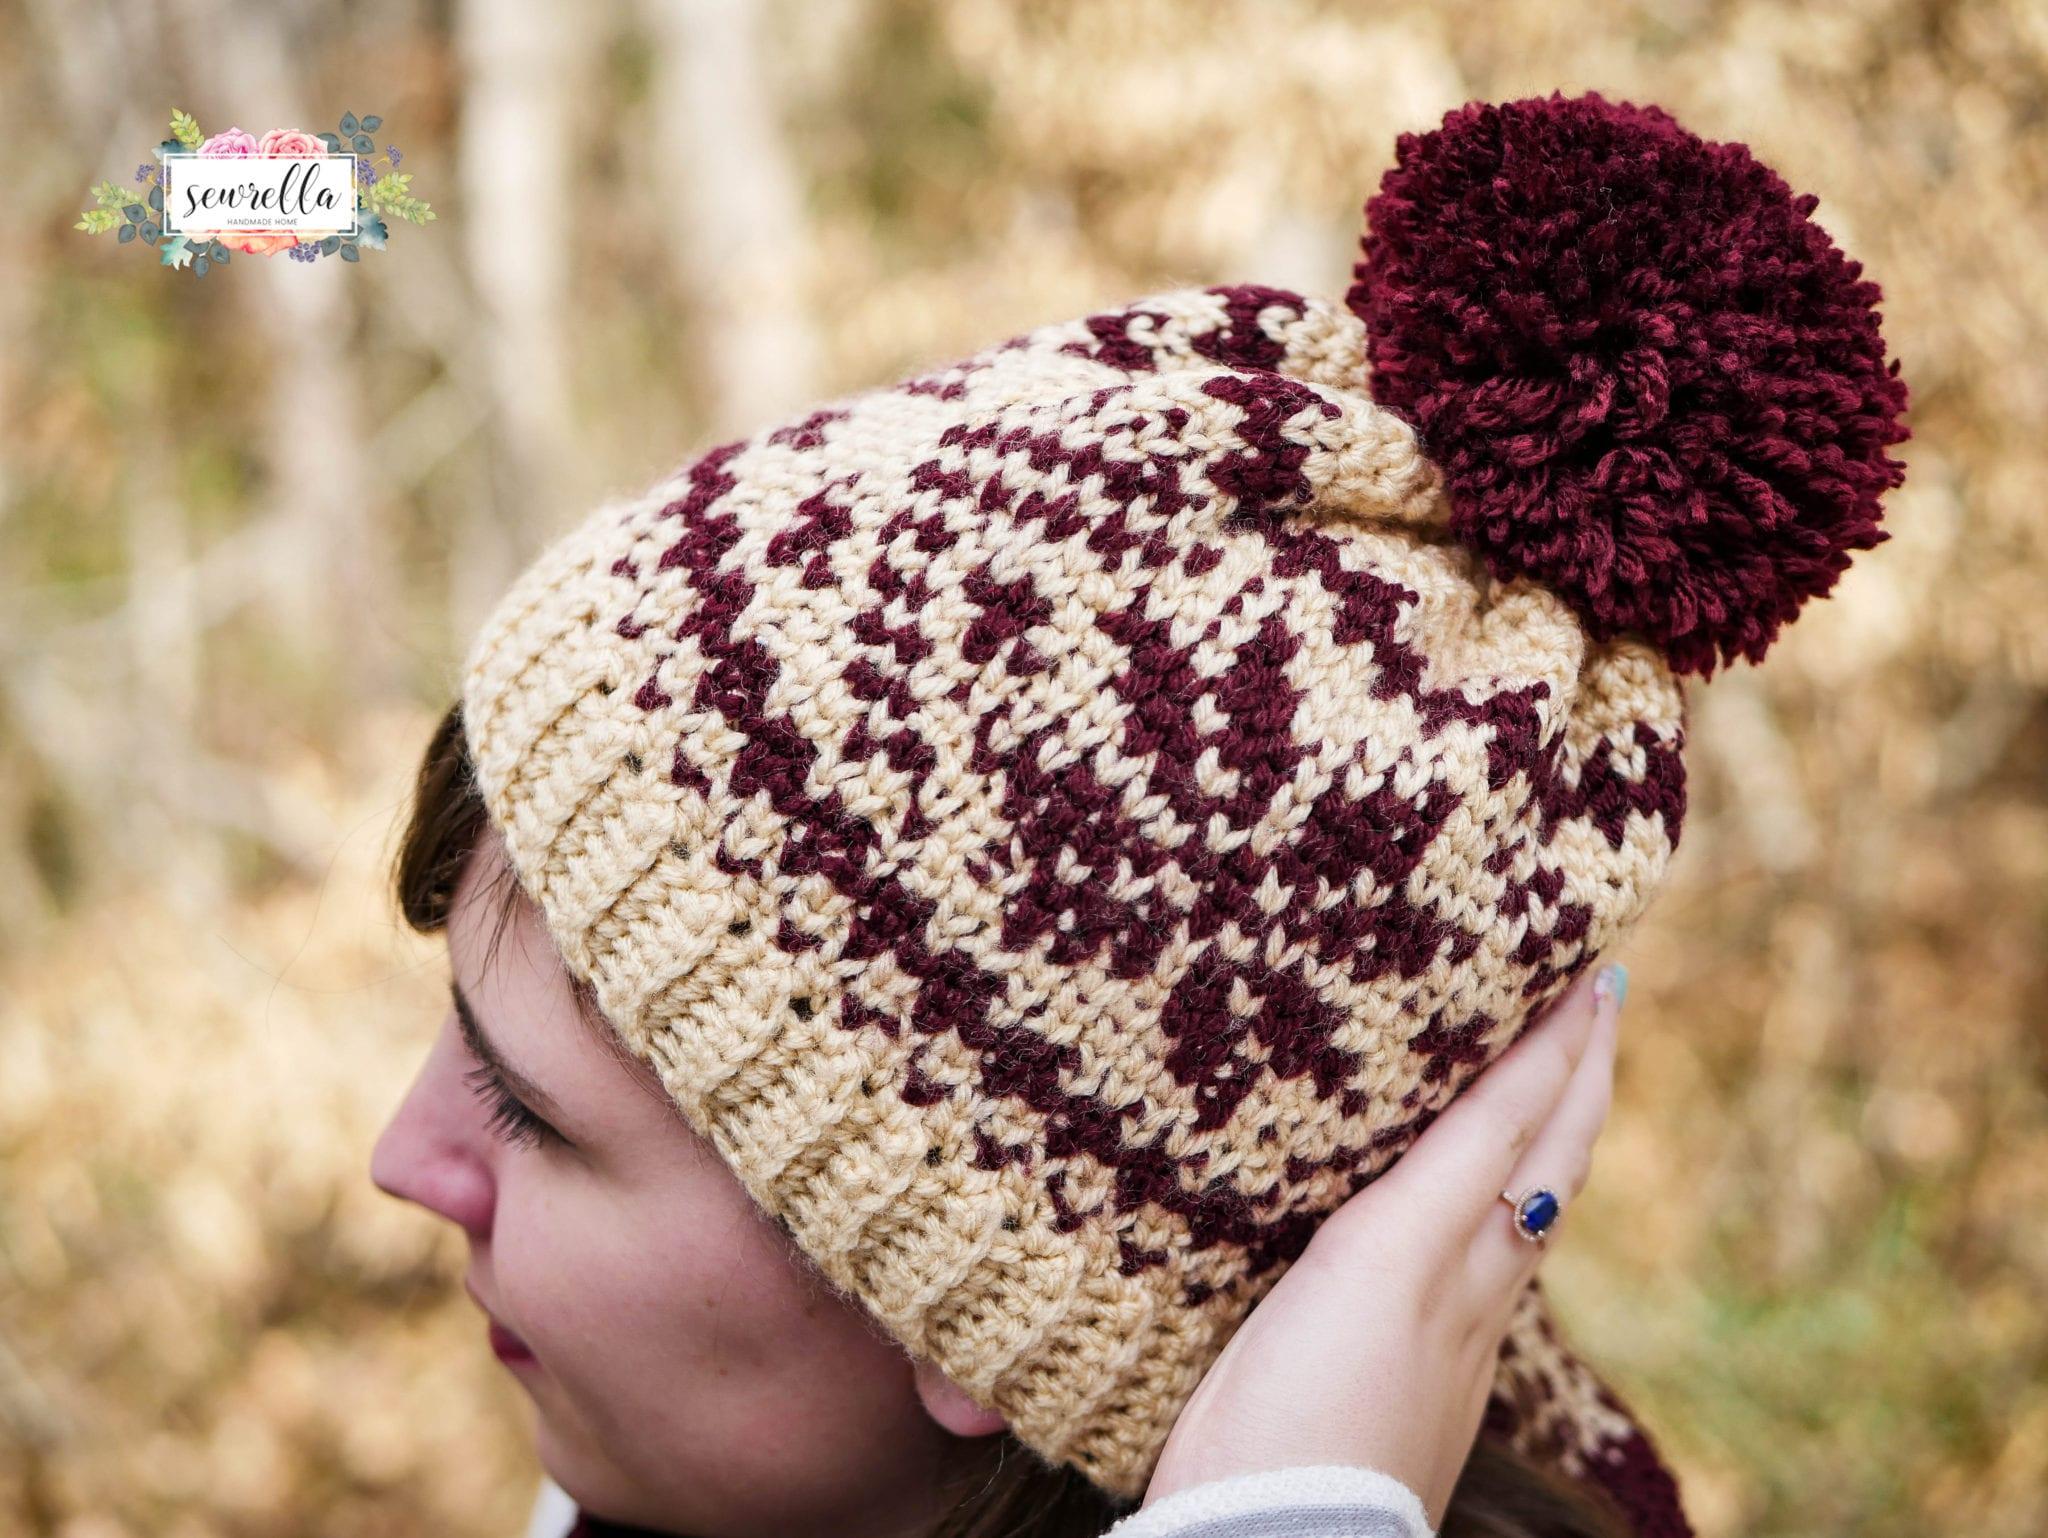 Knitting Or Crocheting Faster : Faux knit fair isle crochet toque cowl sewrella